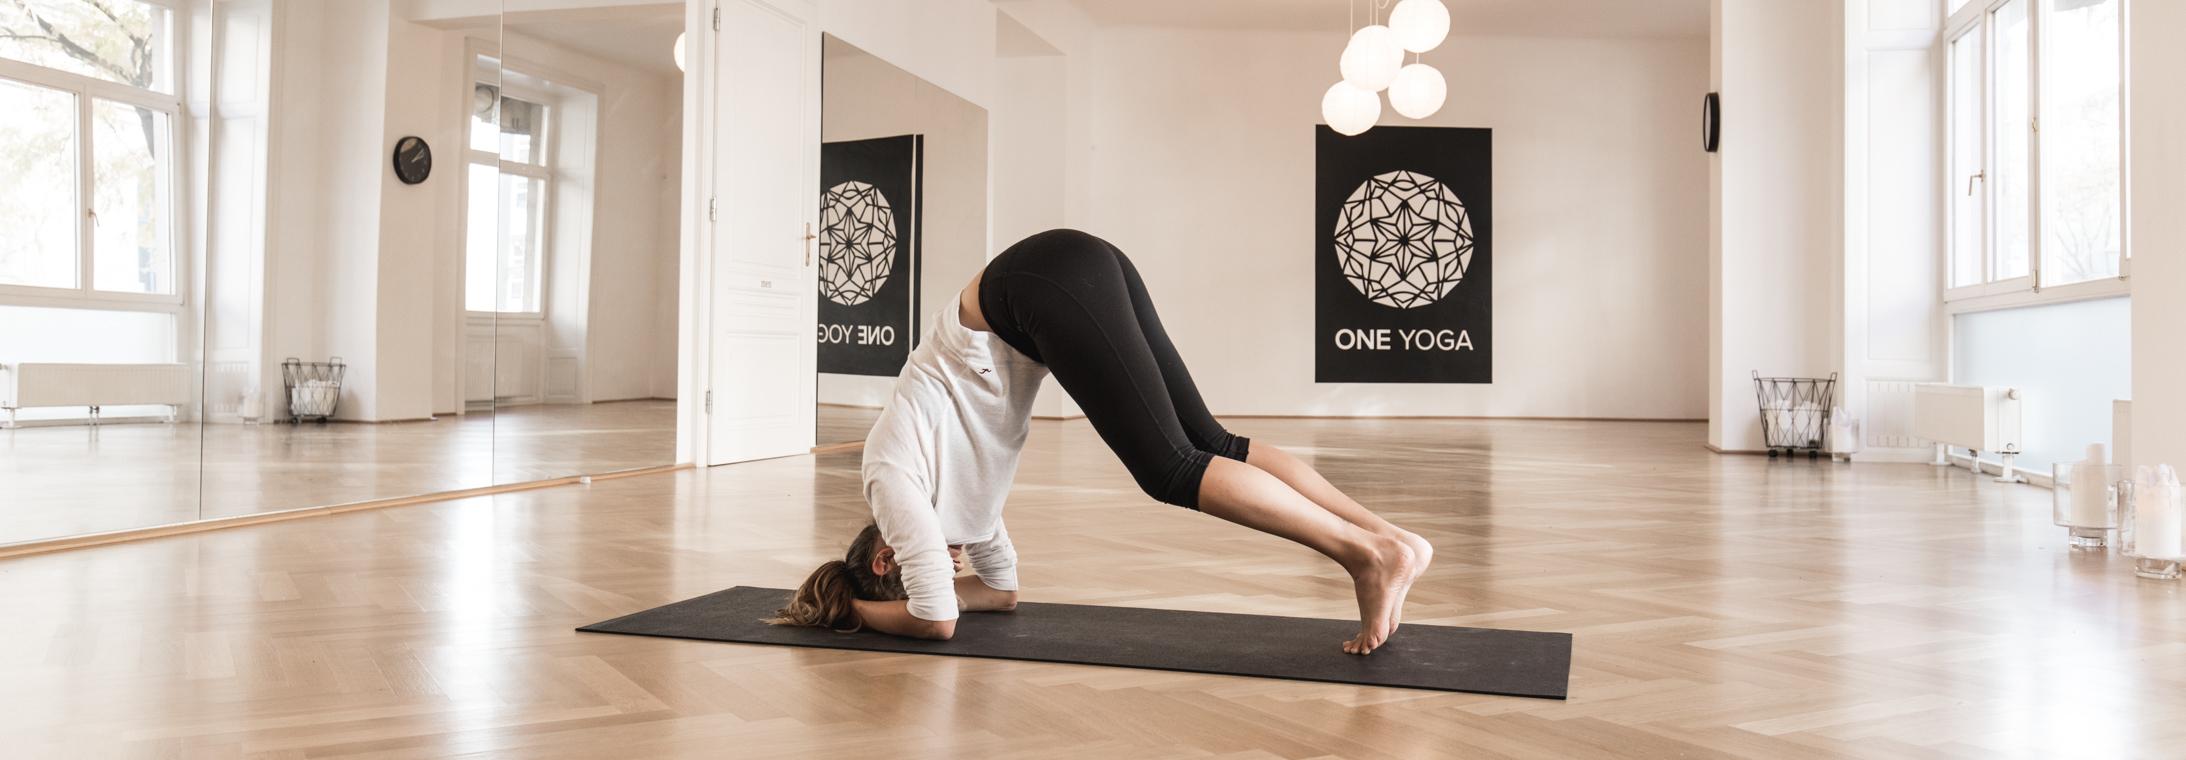 annalaurakummer, one, yoga, sport, fitness, routine, wien, tipp